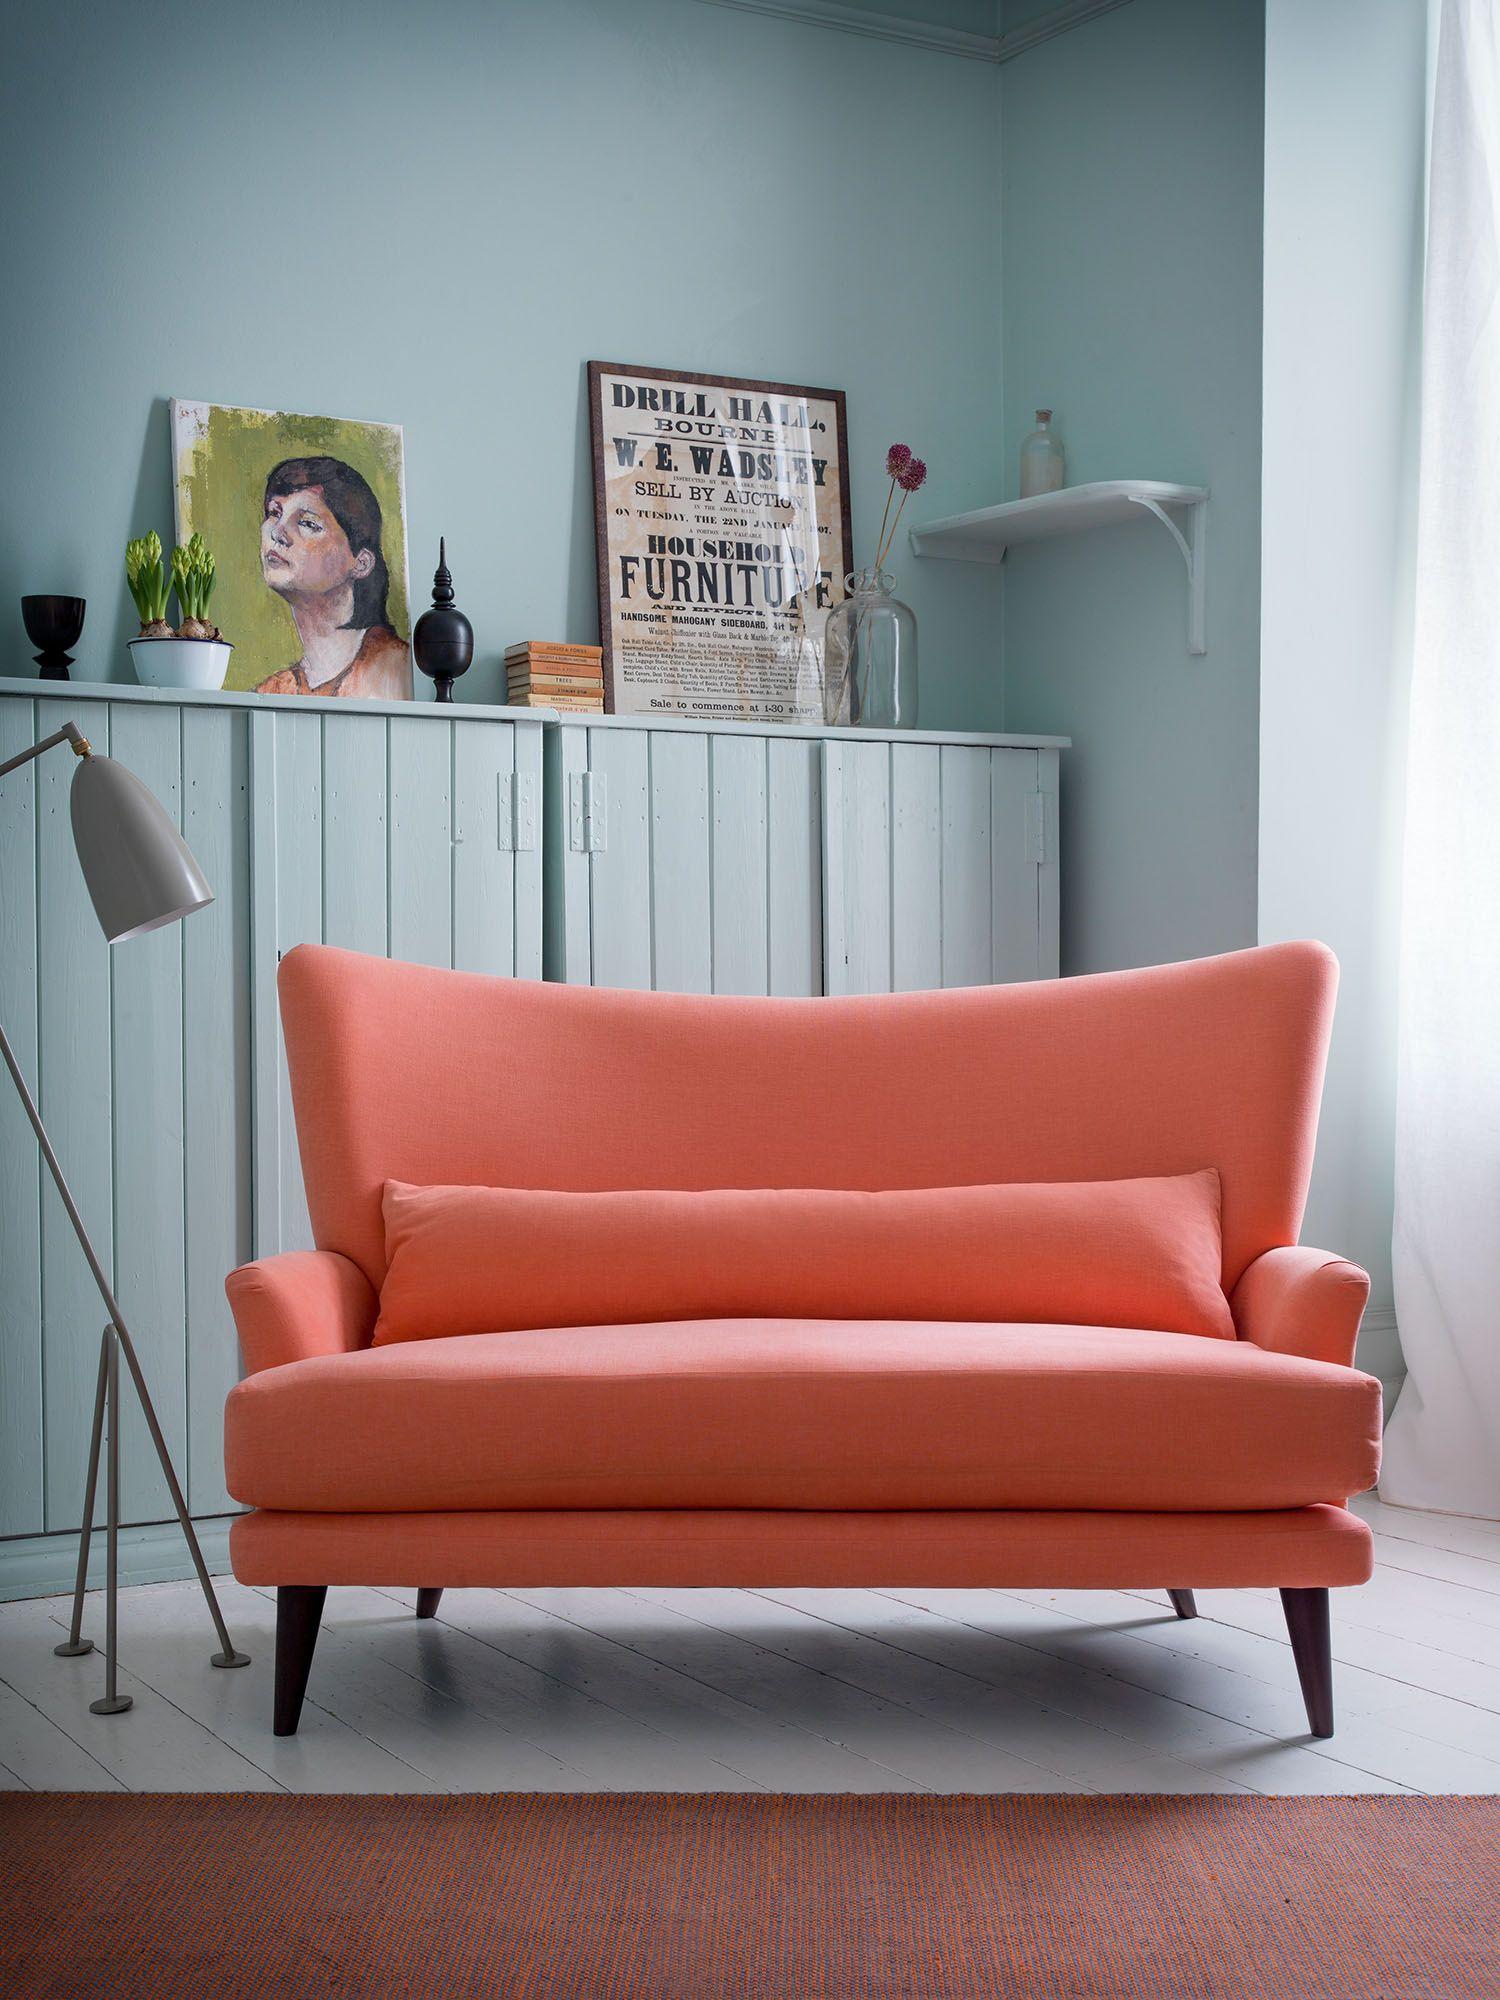 Attraktiv Sofa Scandi Ideen Von Arlo & Jacob | Aragon #contemporary #sofa